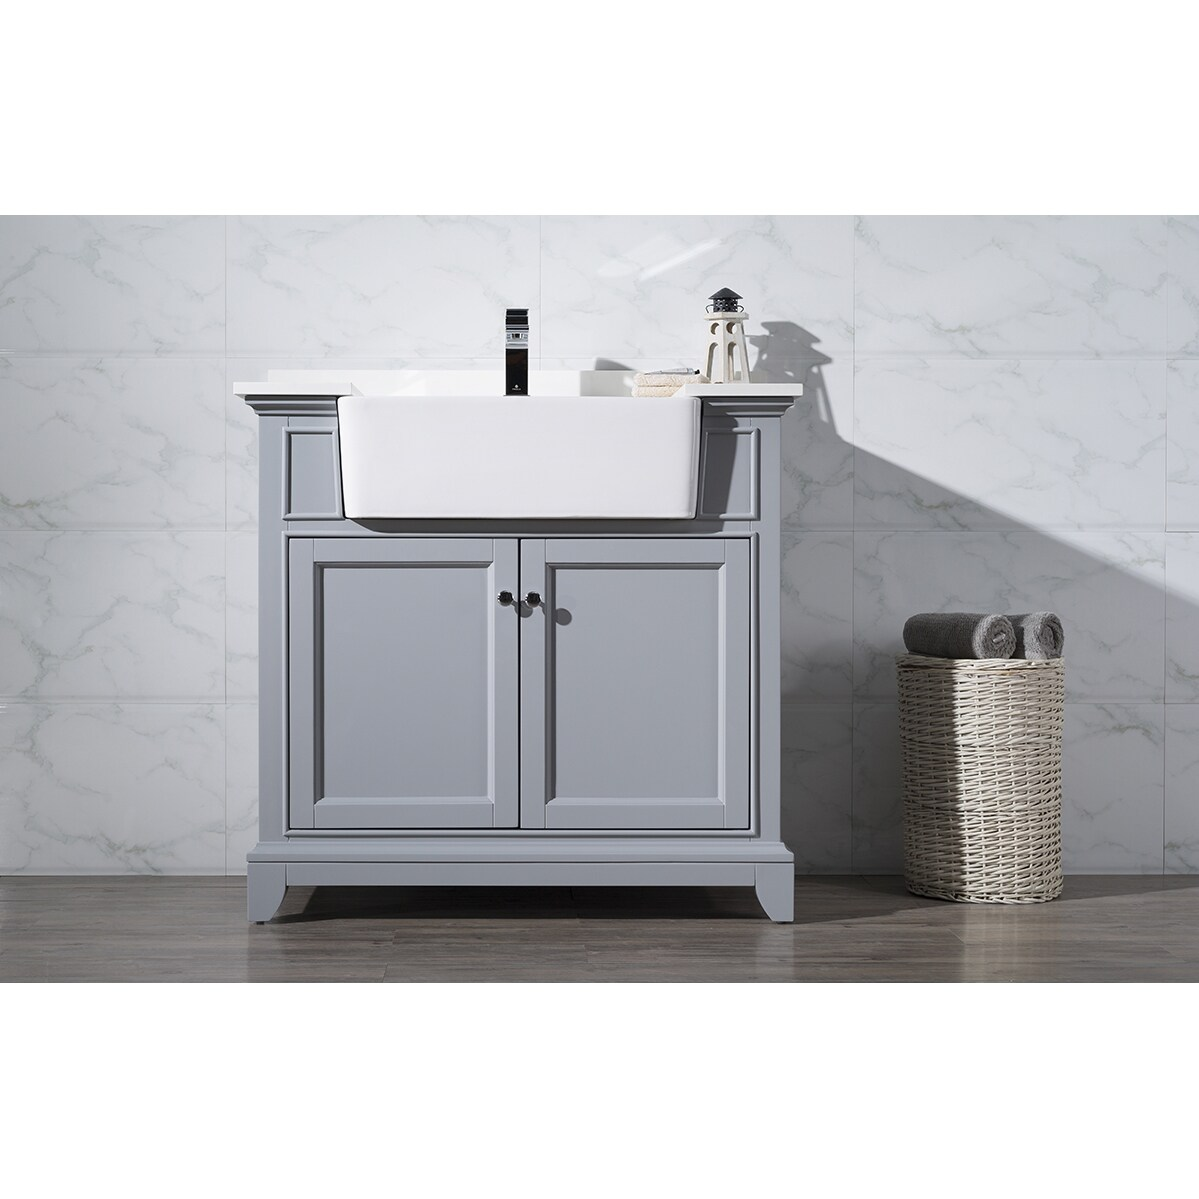 stufurhome helanah grey 36 inch farmhouse apron single sink bathroom vanity